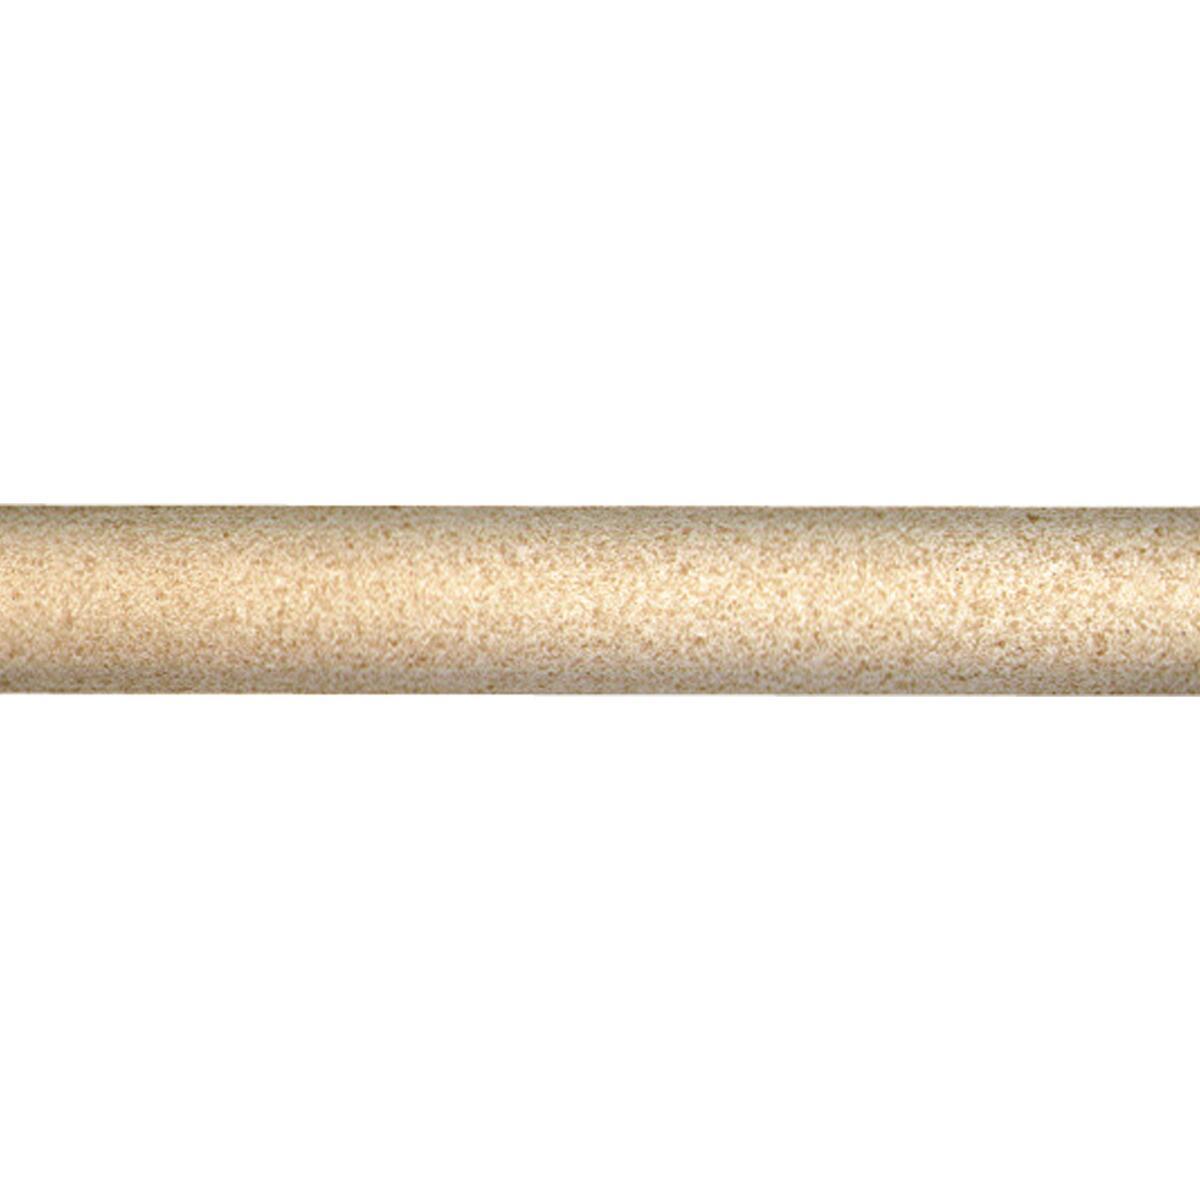 Listello Country L 1.5 x 10 cm beige